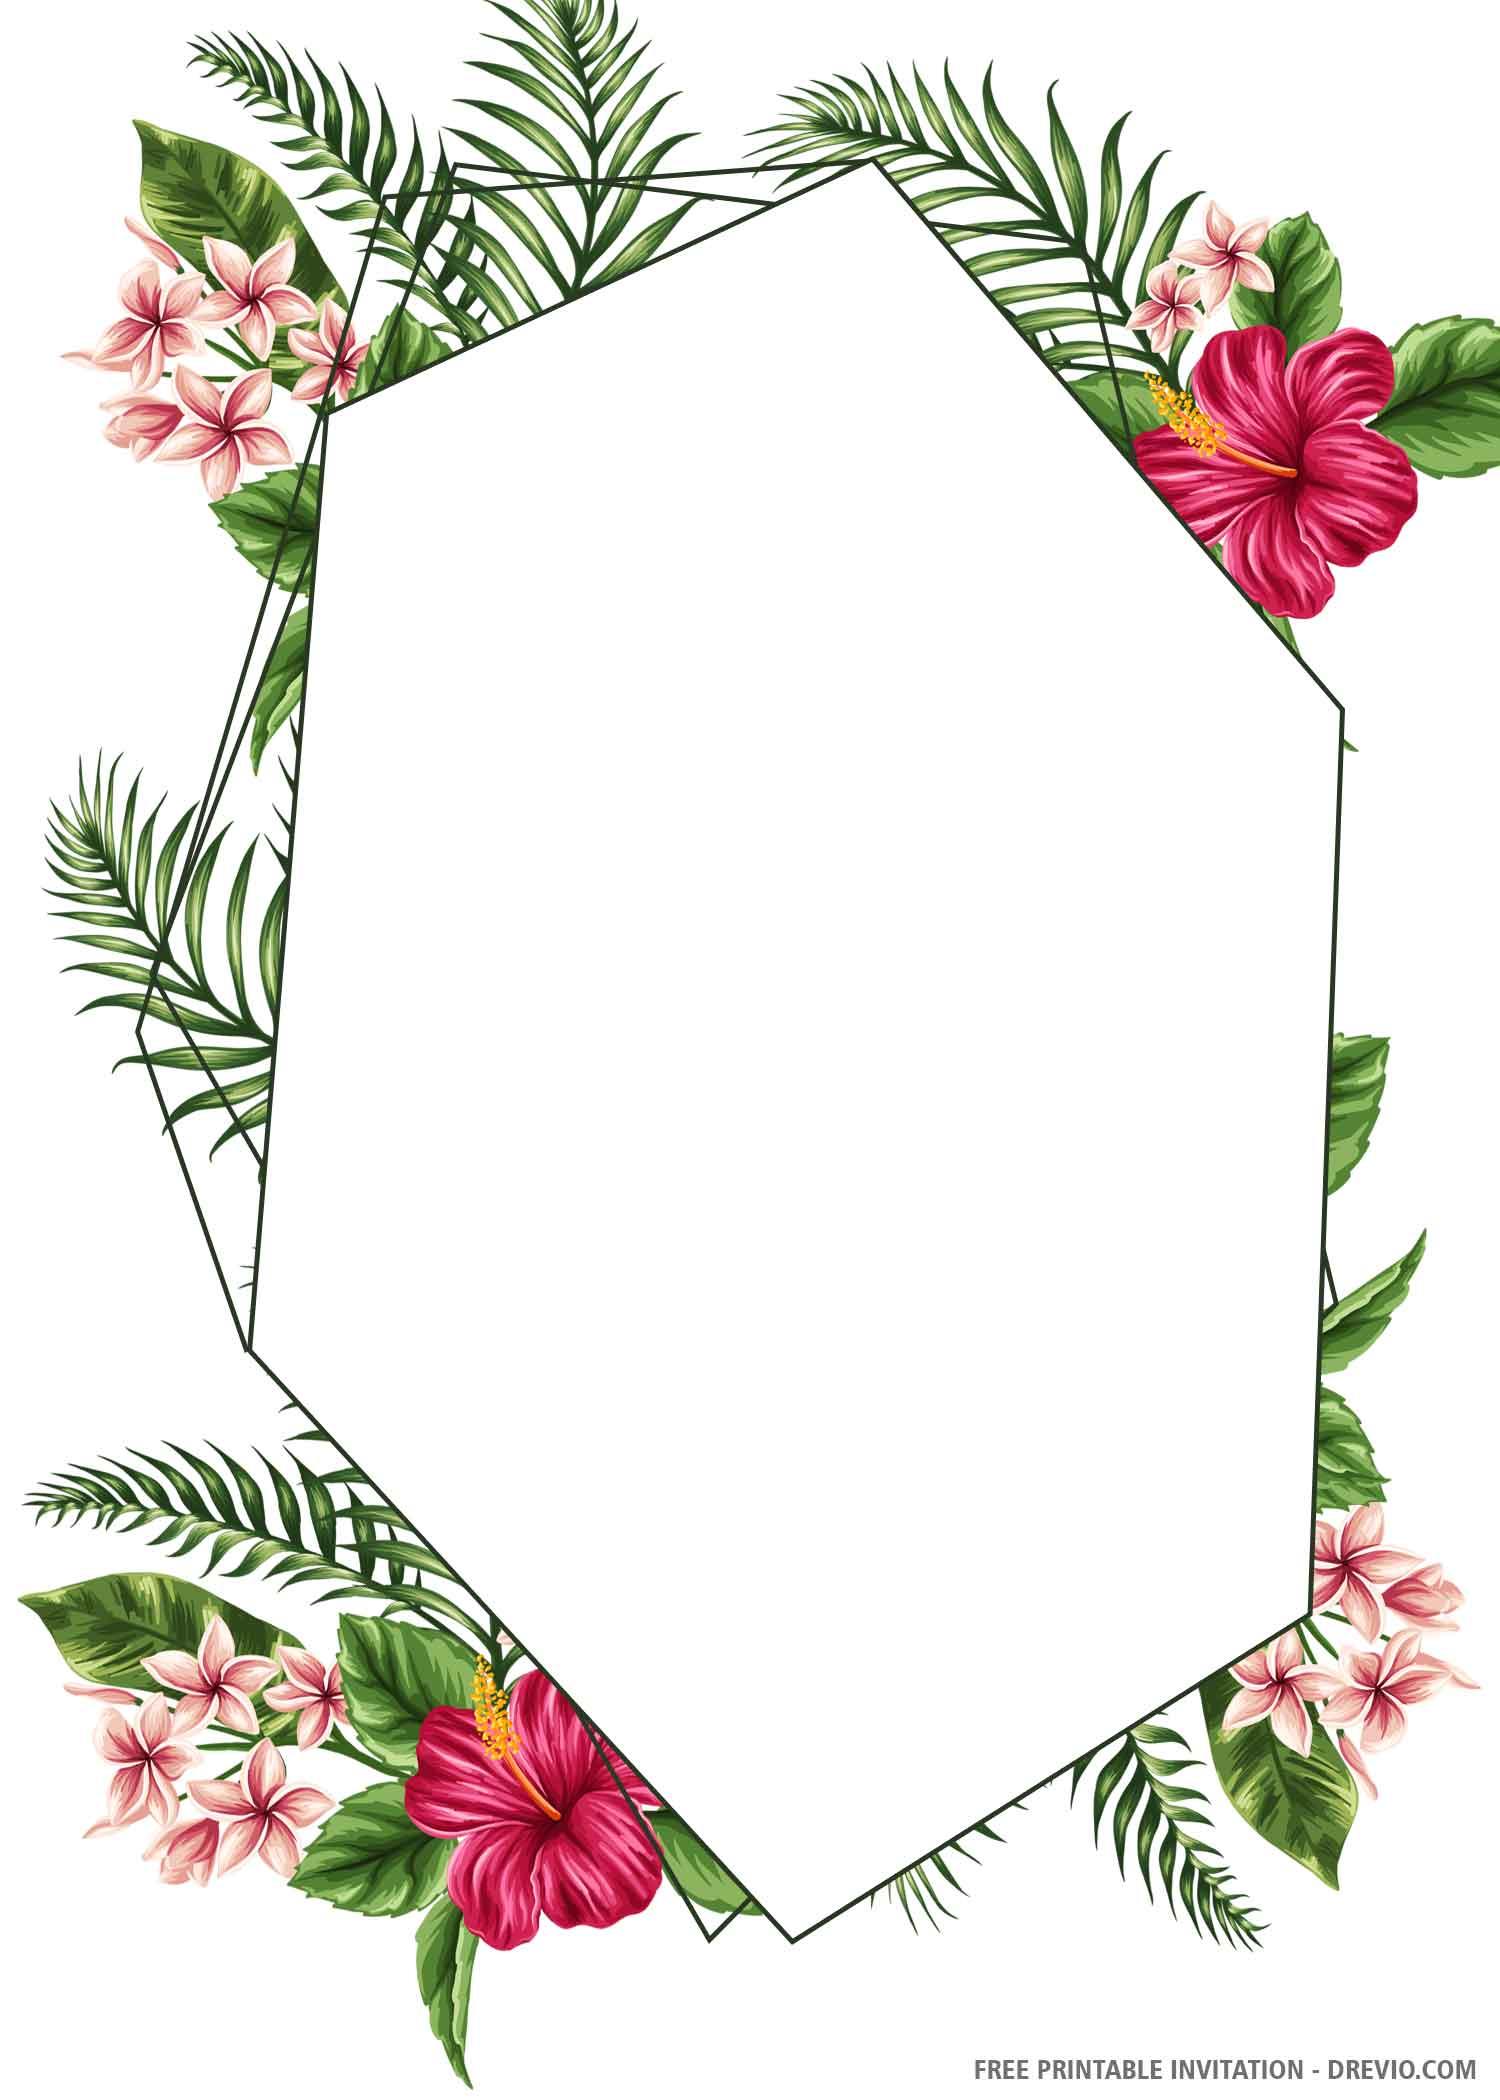 Free Printable Tropical Hexagon Wedding Invitation